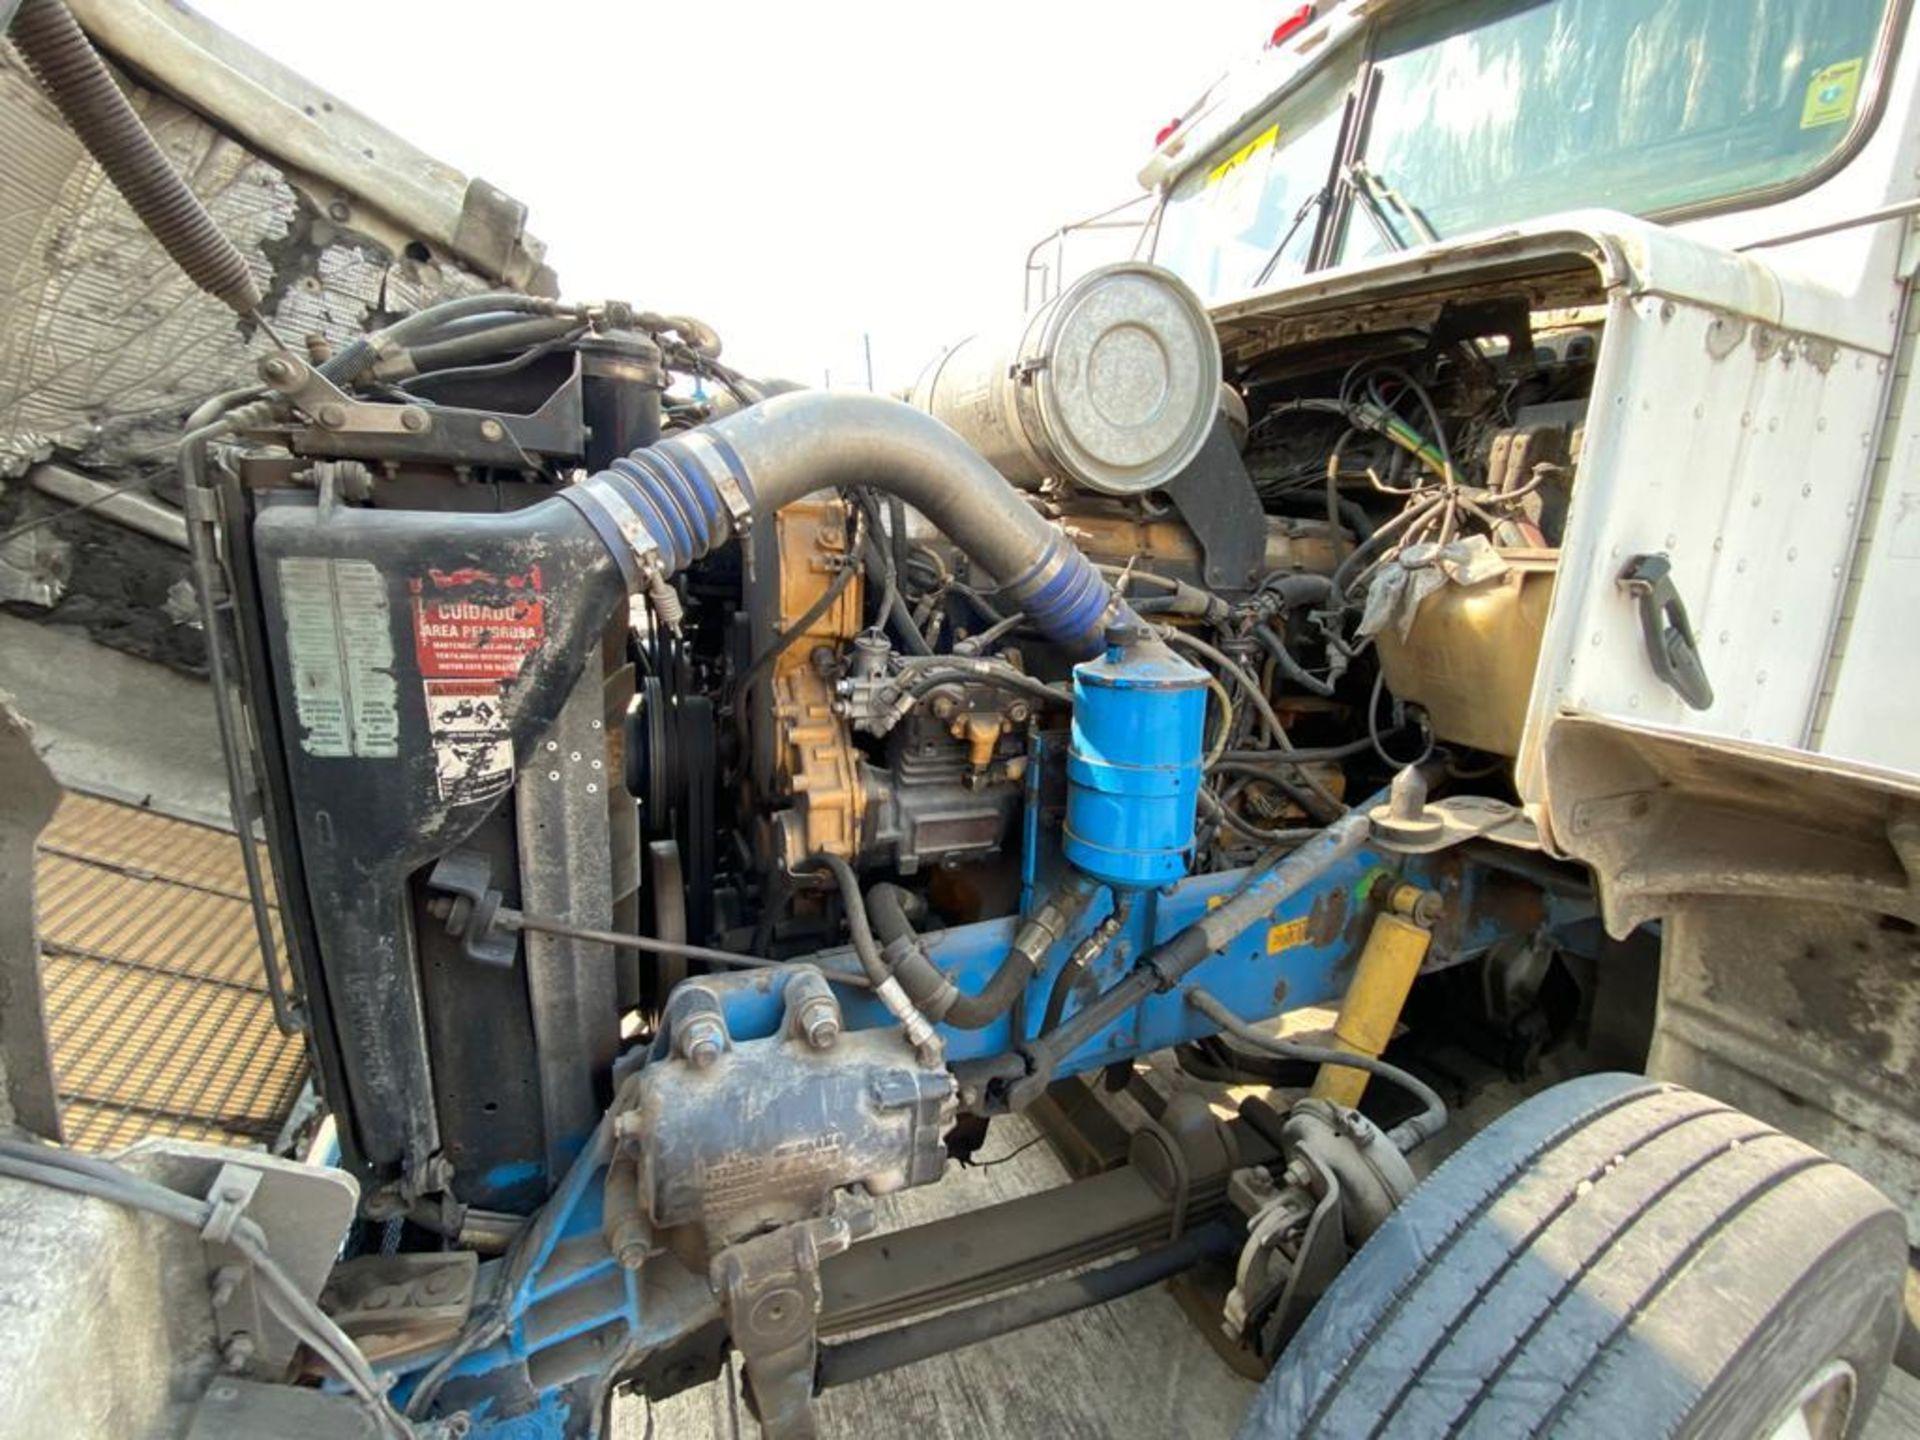 1998 Kenworth Sleeper truck tractor, standard transmission of 18 speeds - Image 60 of 75